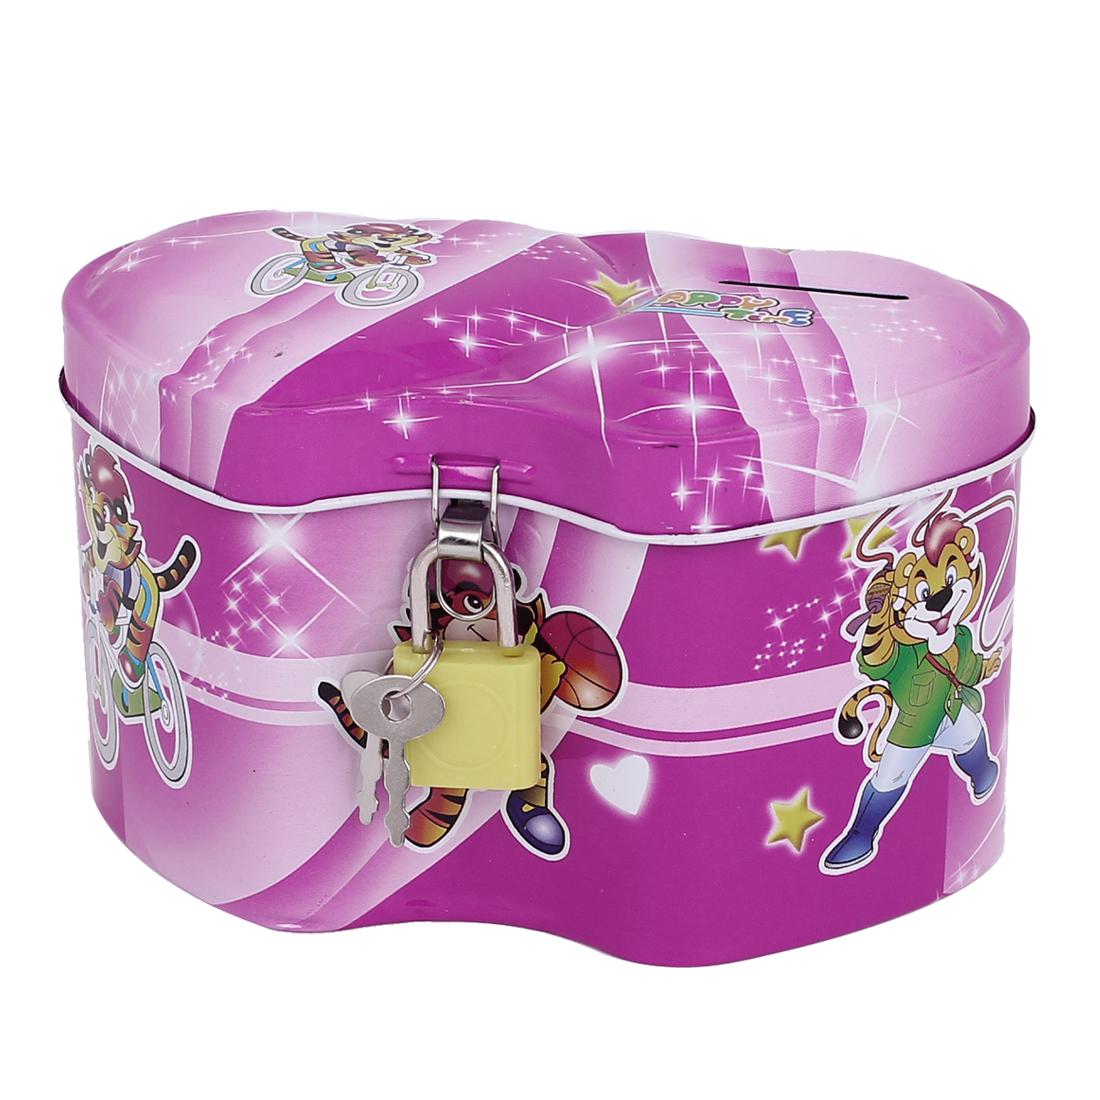 Household Children Cartoon Animal Printed Metal Two Hearts Designed Piggy Bank Money Saving Box Pink w Padlock